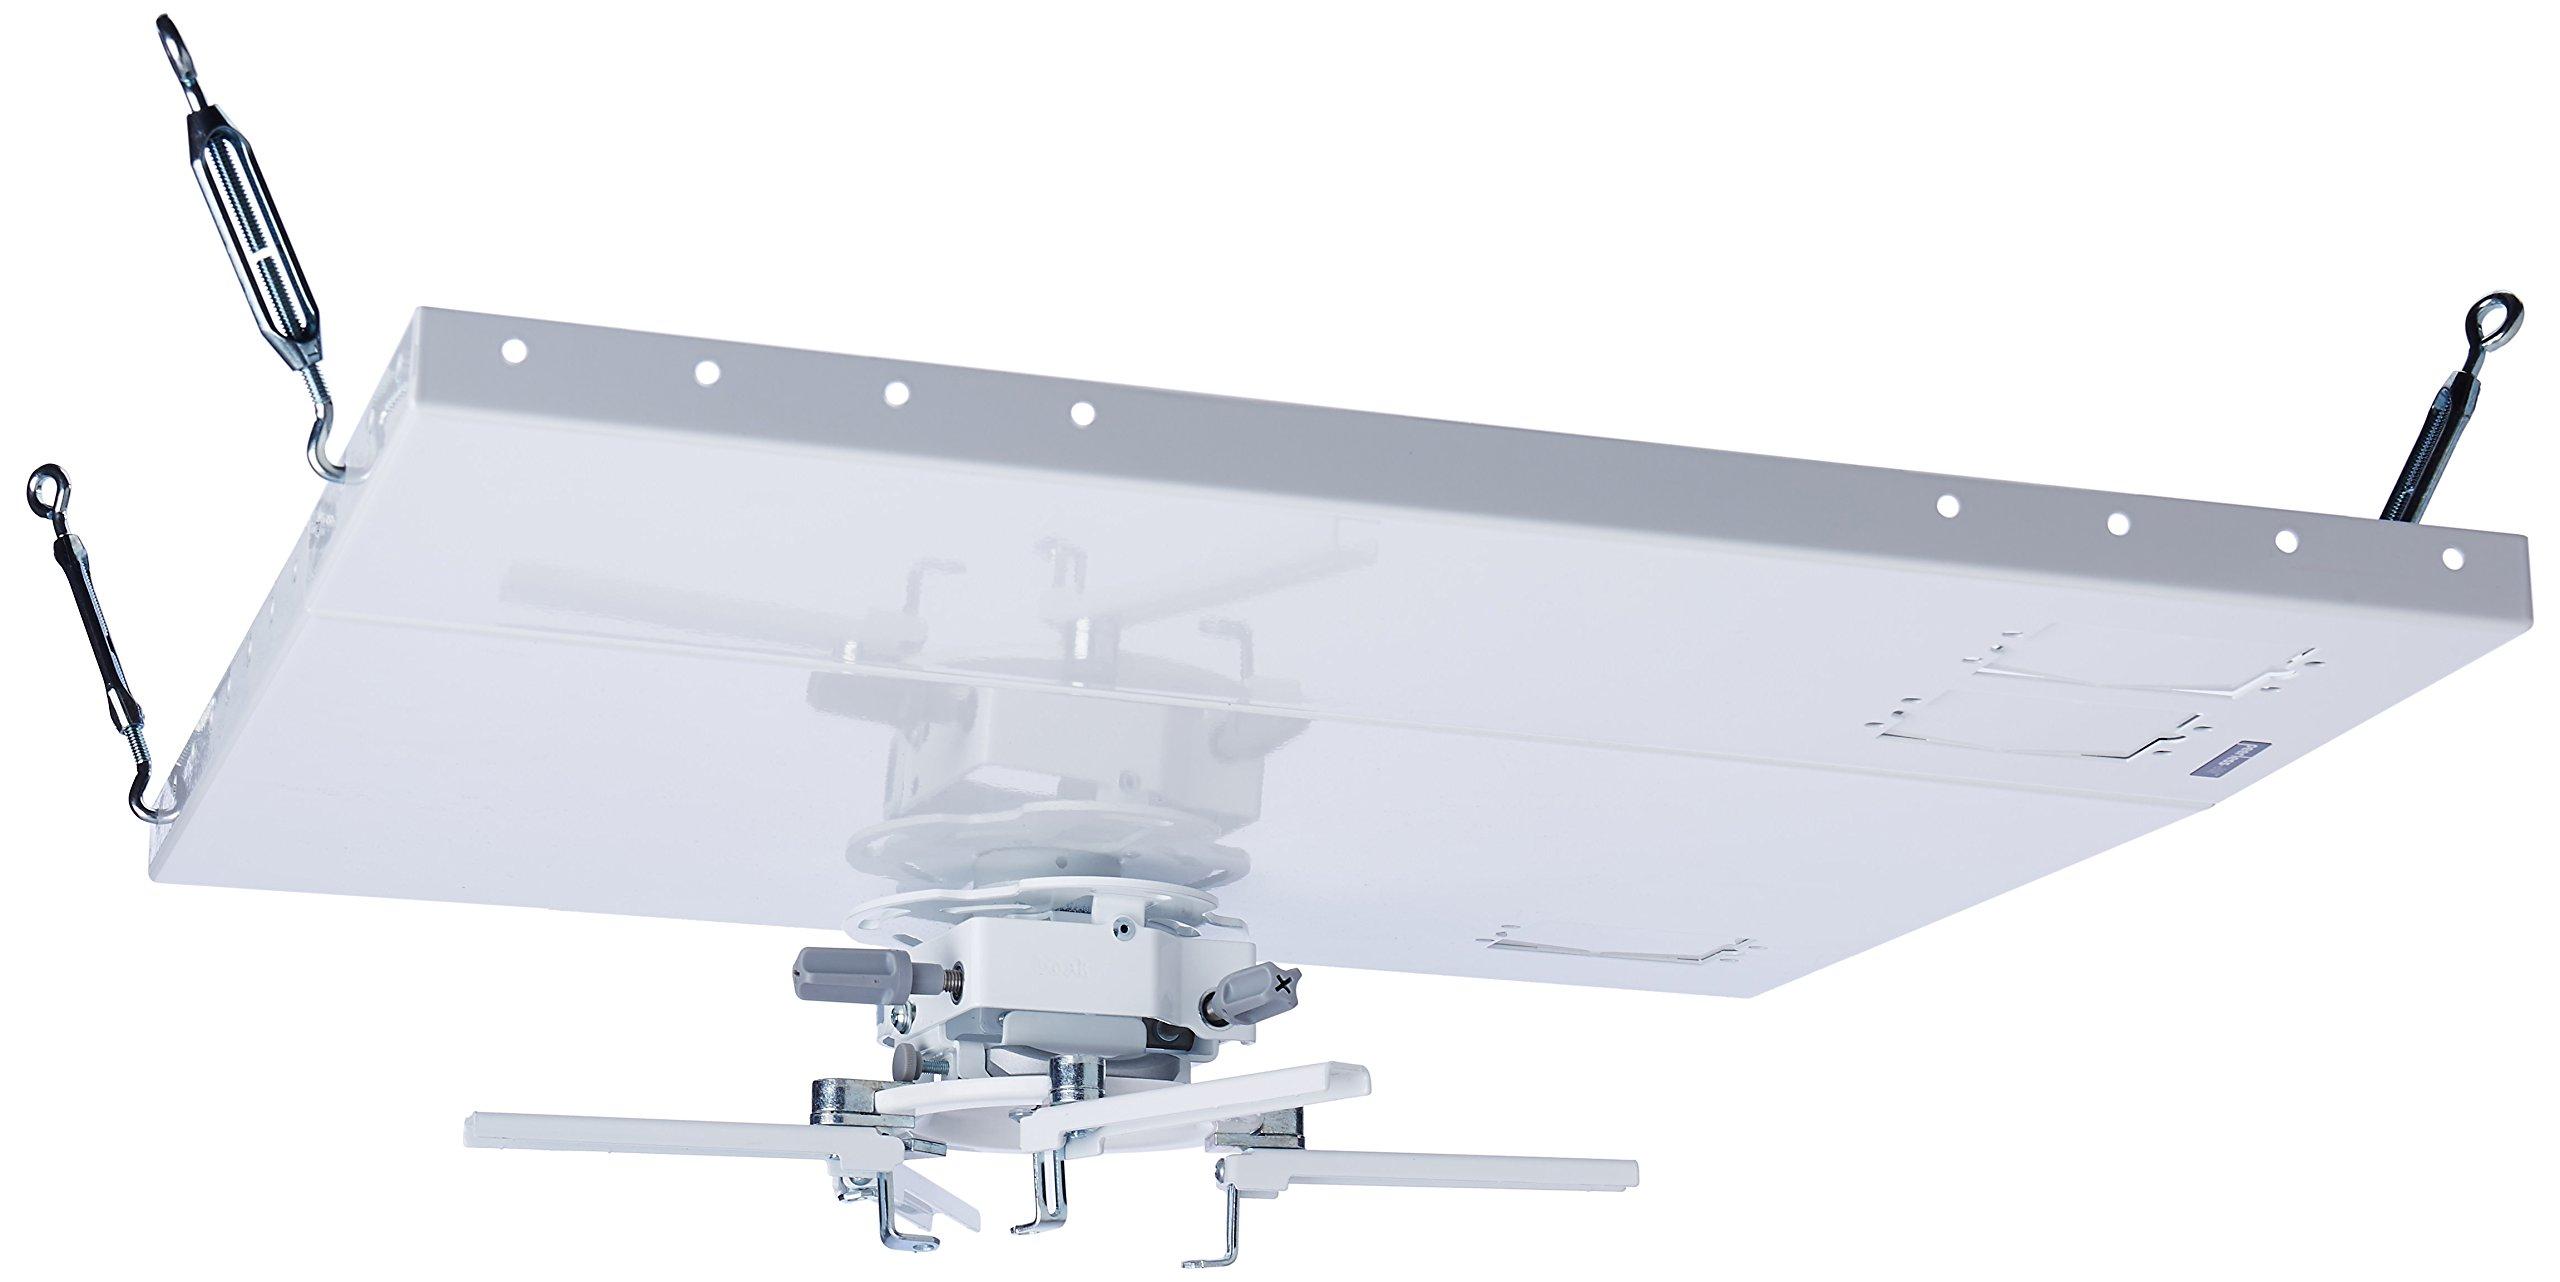 Peerless PRGS-455 Mounting Suspension for Projector by Peerless